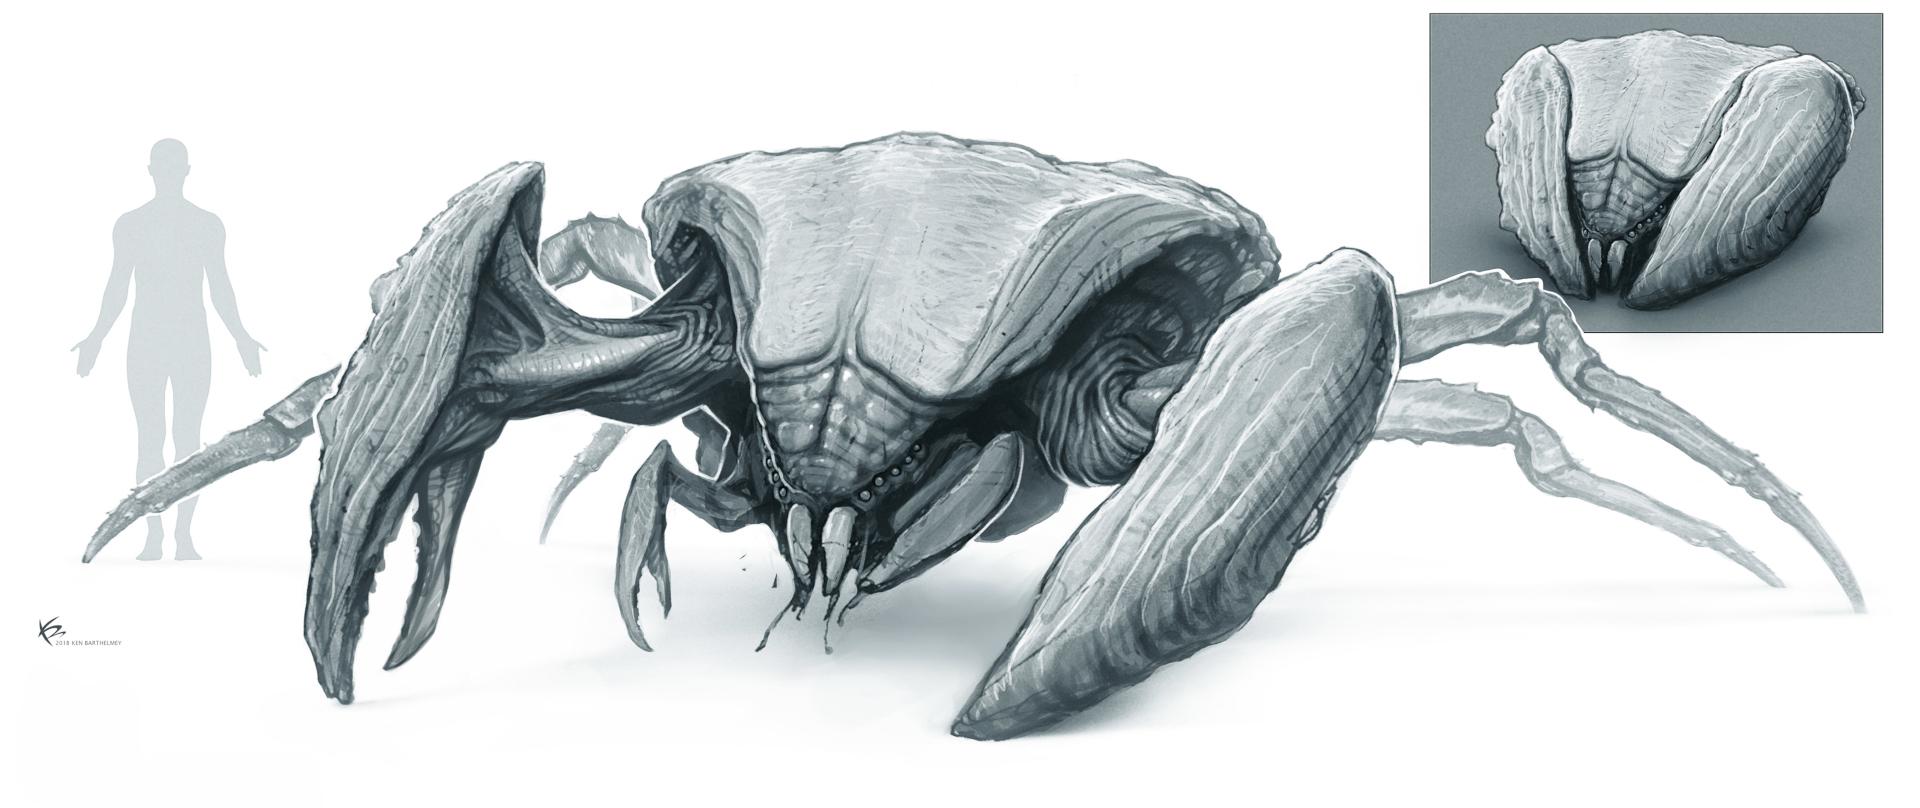 Godzilla vs Kong - Hollow Earth creature design by ADI